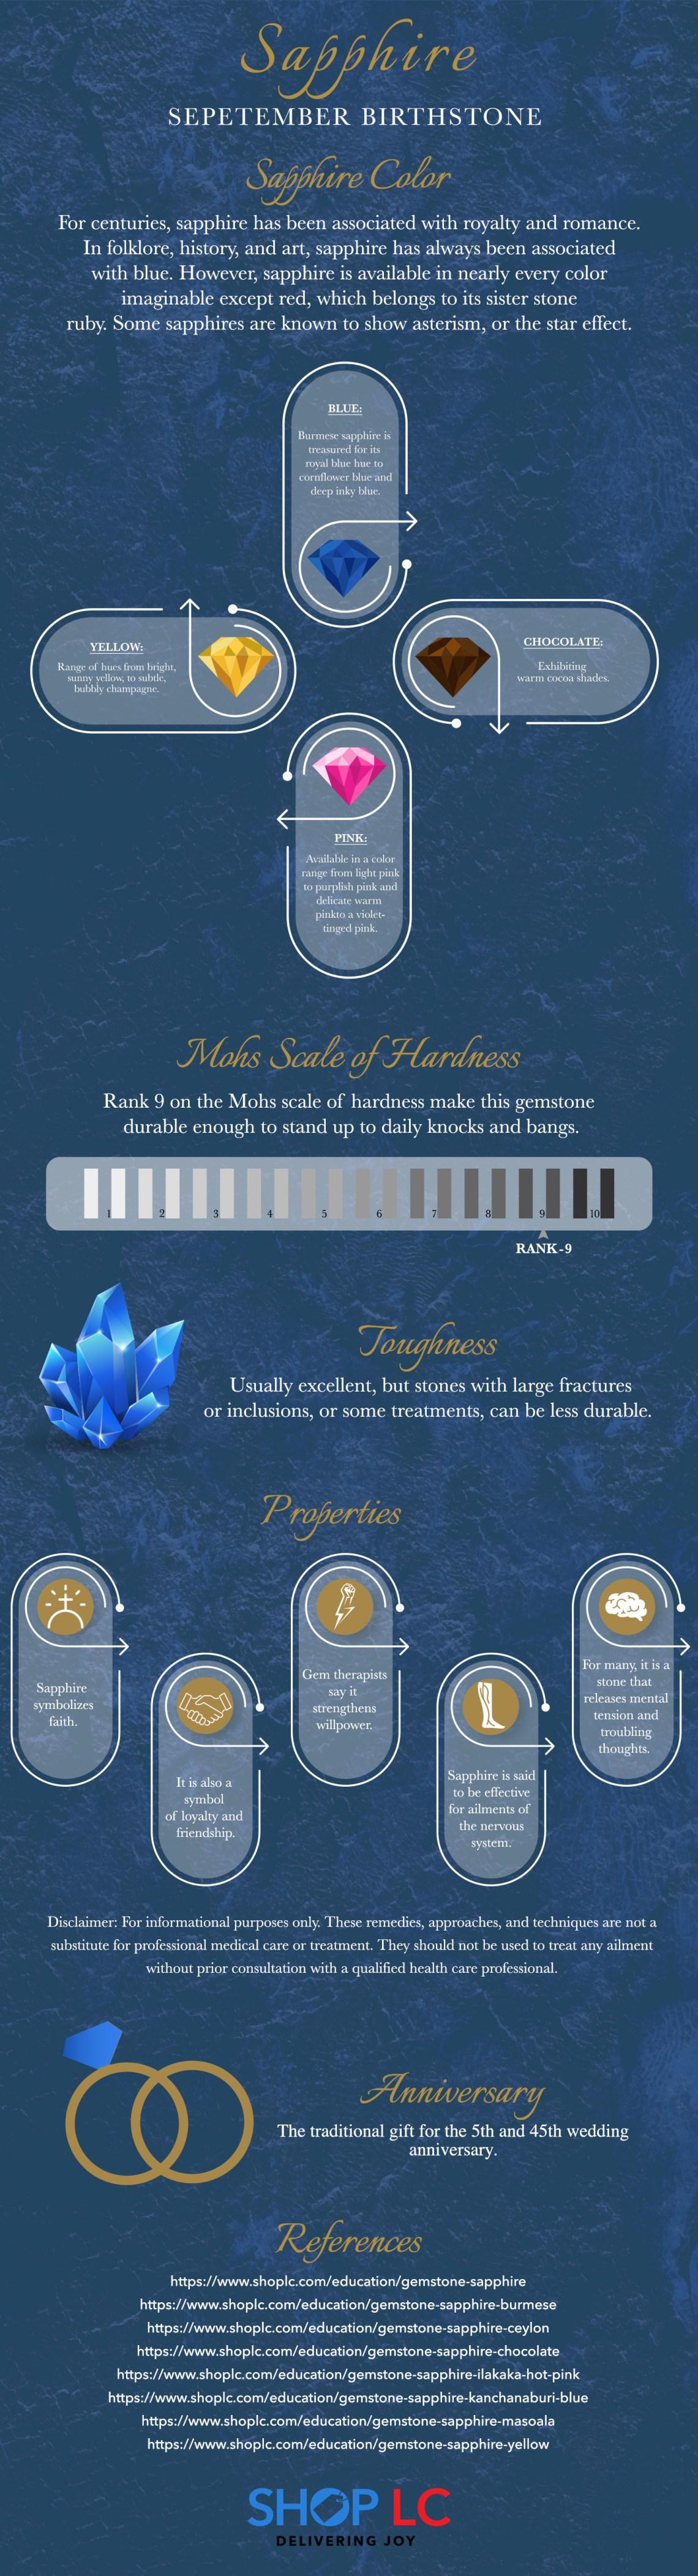 Sapphire September birthstone infographic.